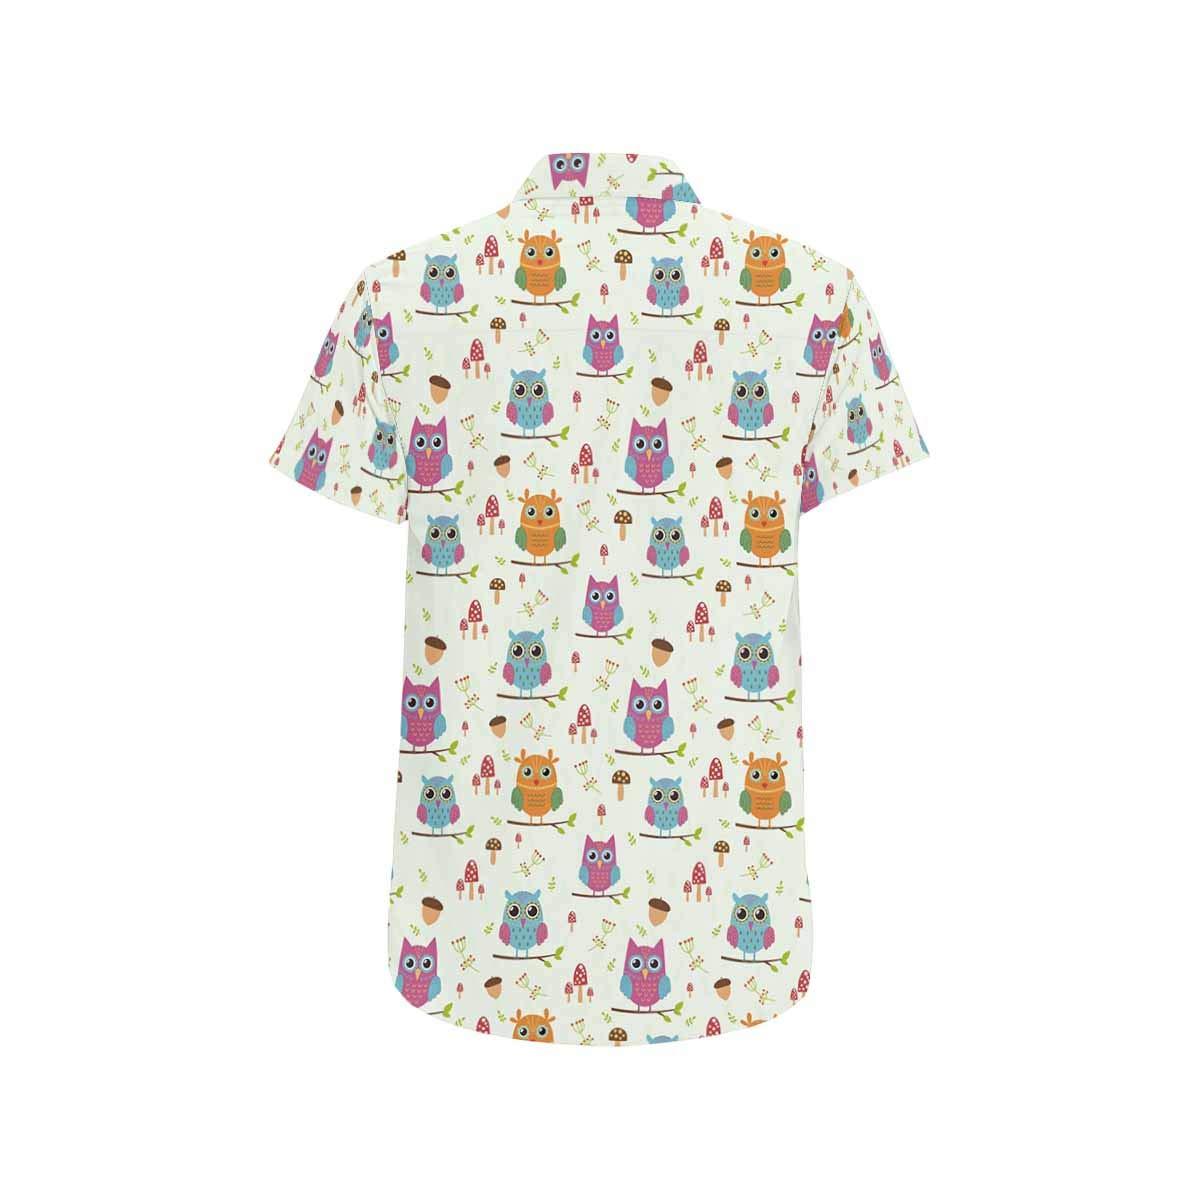 InterestPrint Mens Botton Up Shirt Cute Orange Fruits T Shirts for Regular Fit